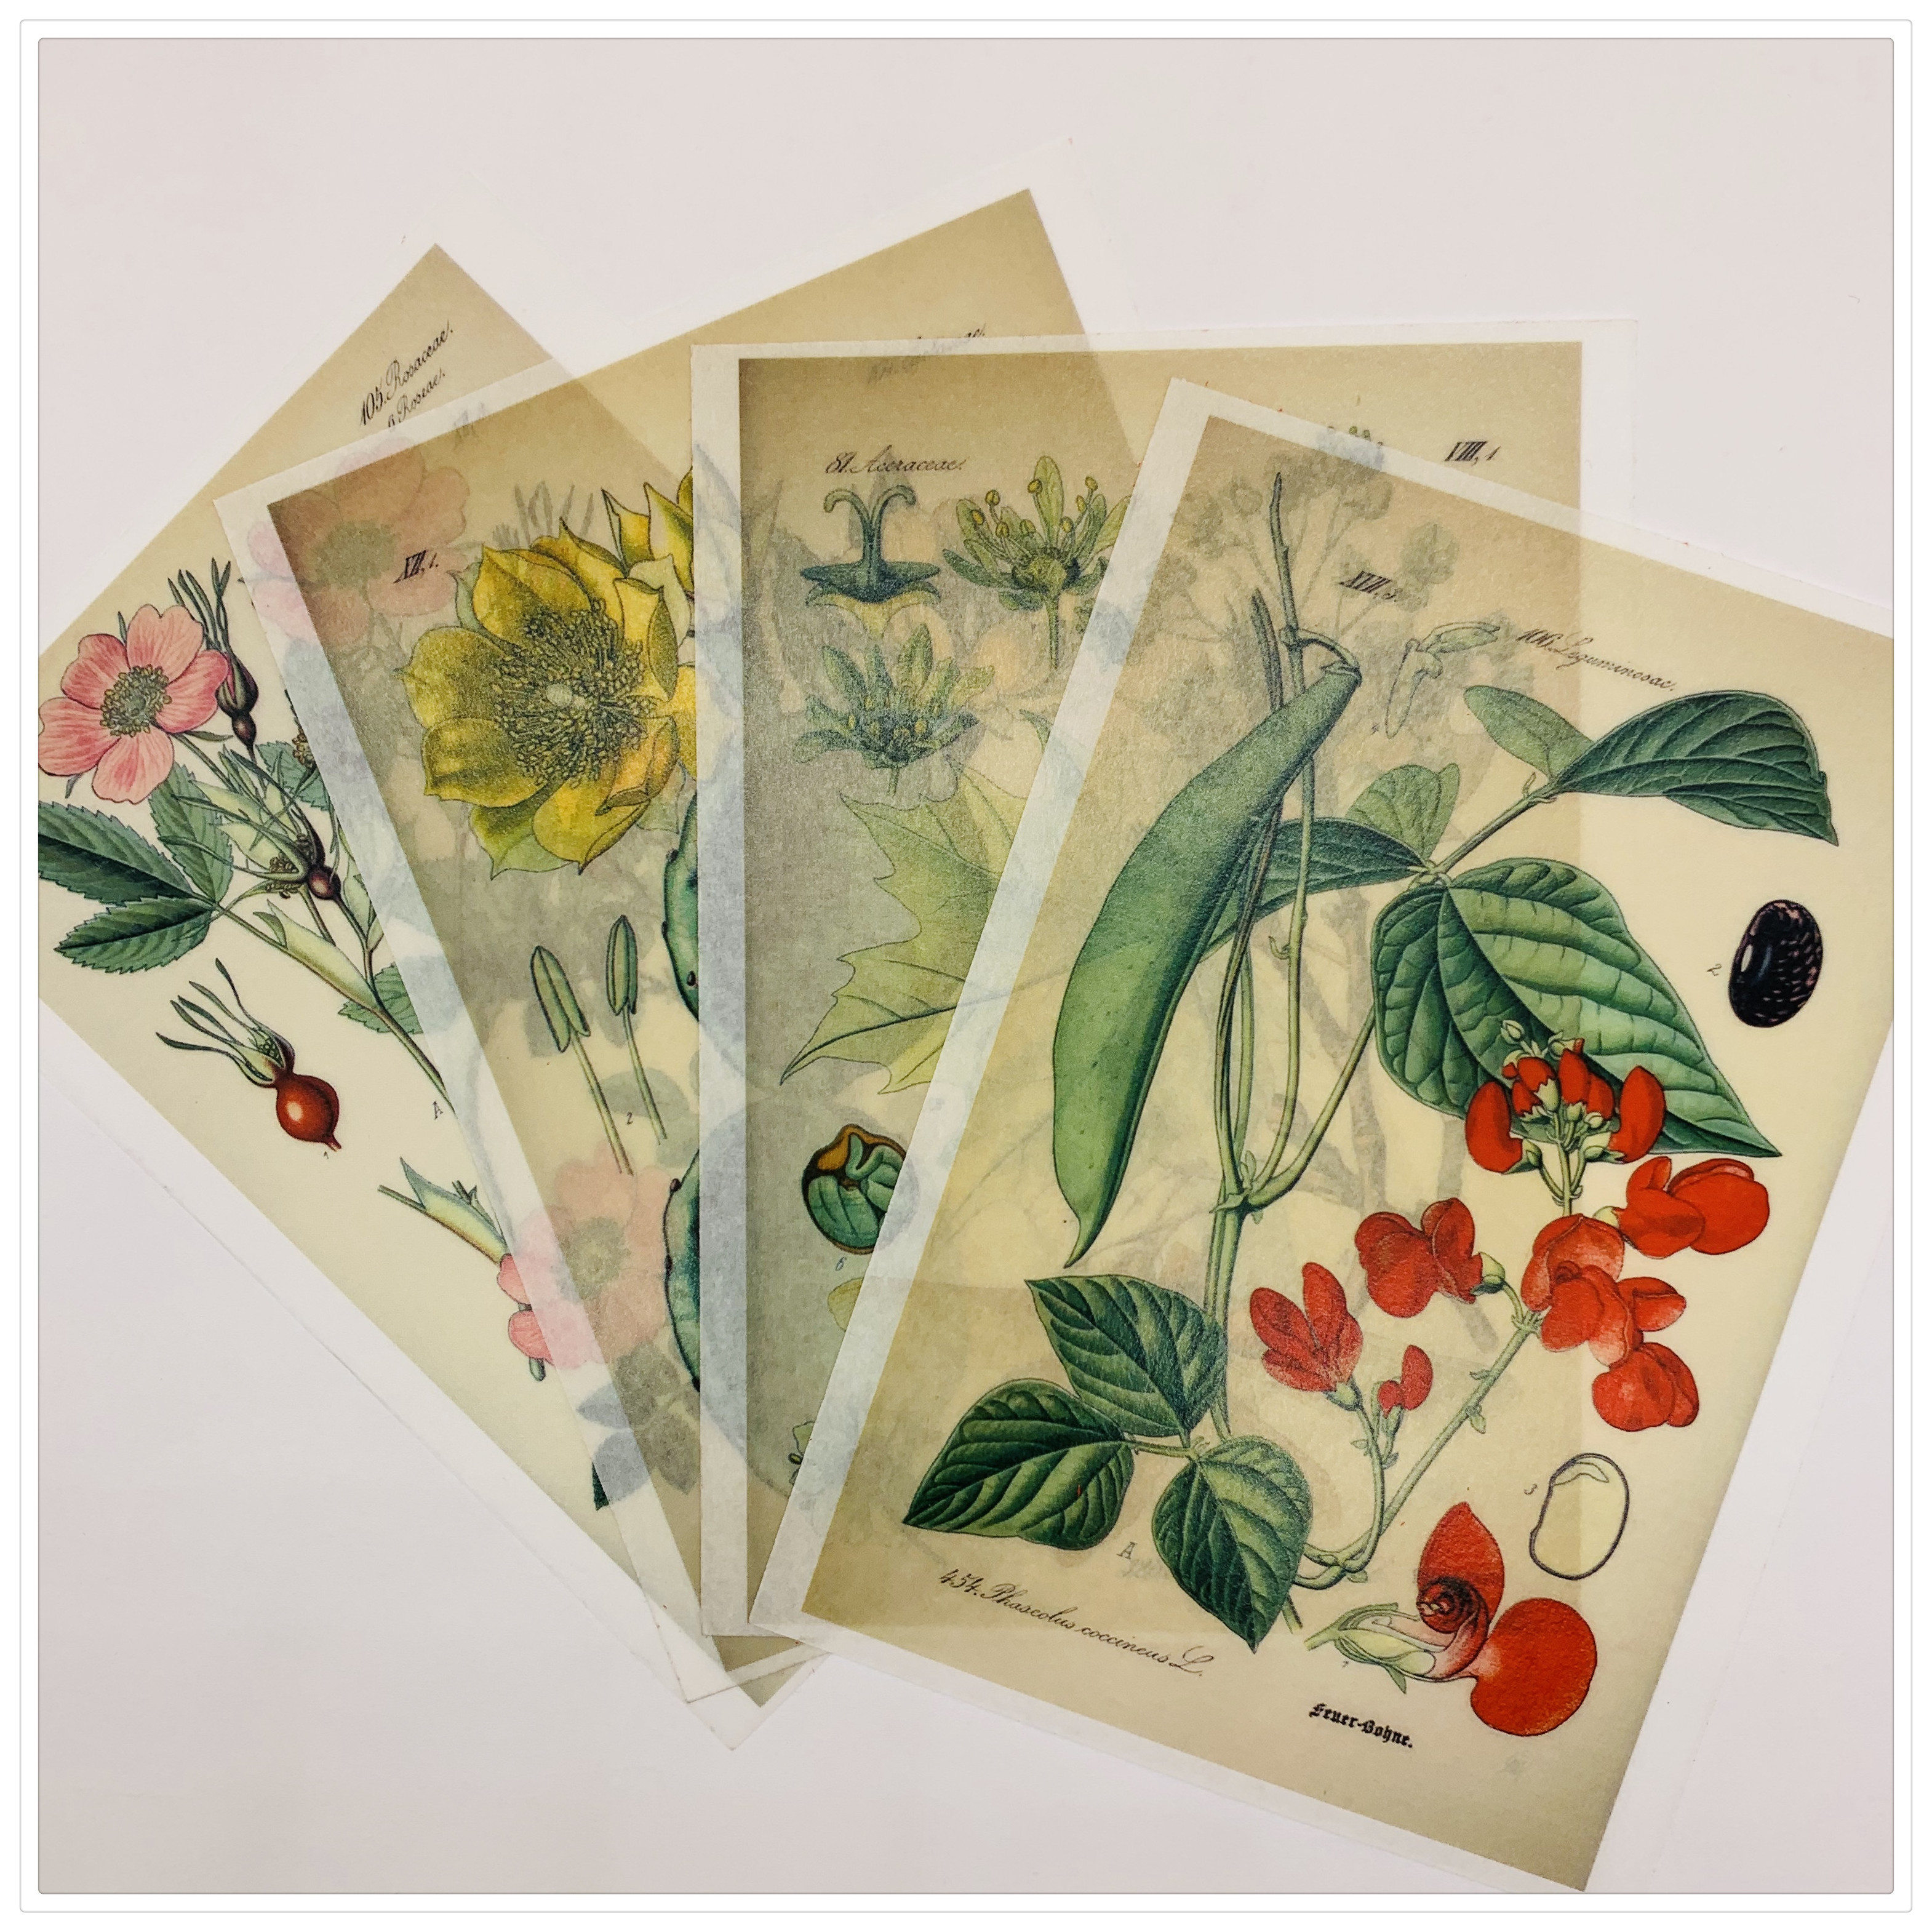 12PCS Vintage Botany Priming Stickers DIY Scrapbooking Album Junk Journal A6 Diary Happy Planner Decoration Stickers